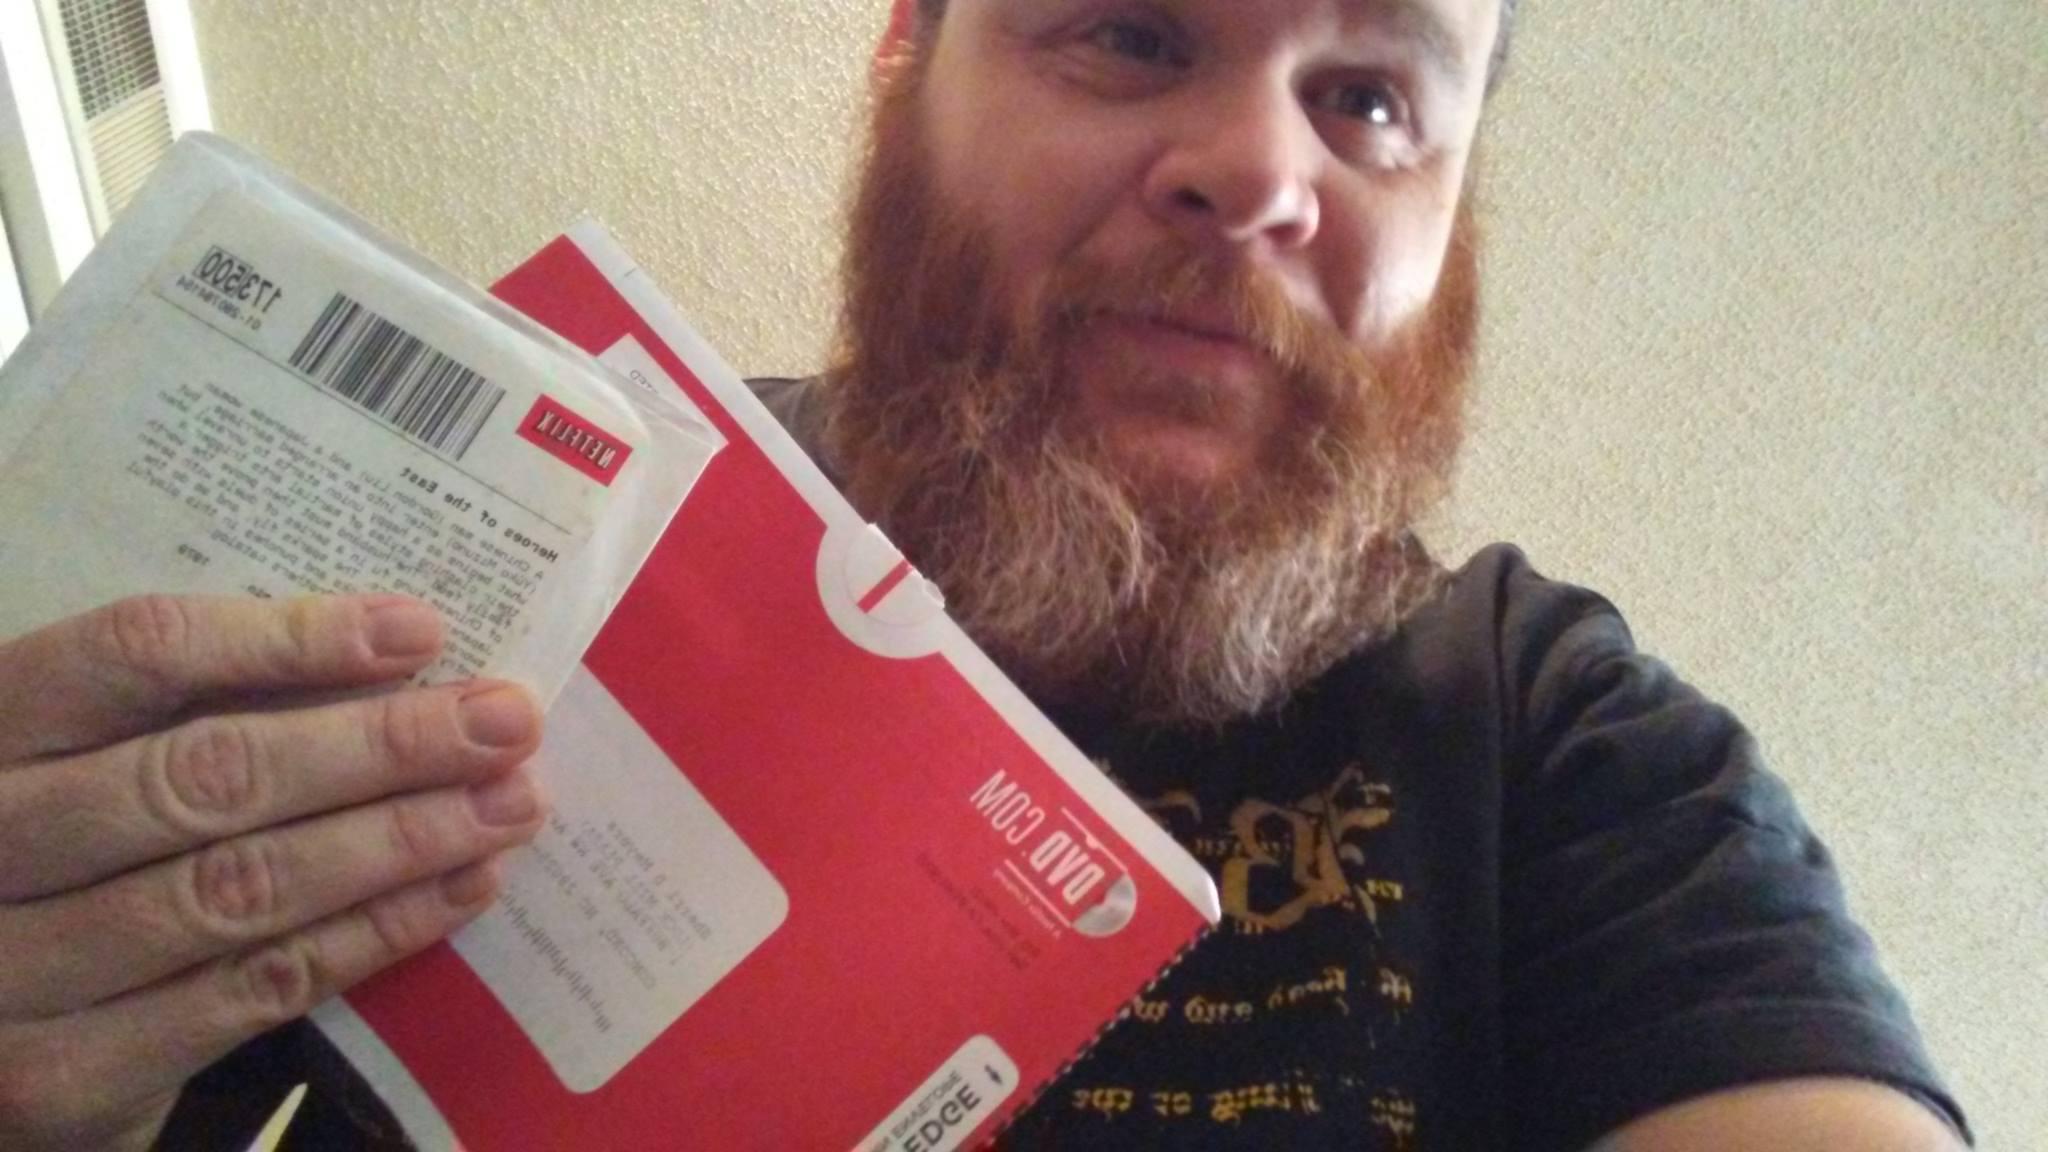 James Meyers with Netflix DVD envelopes